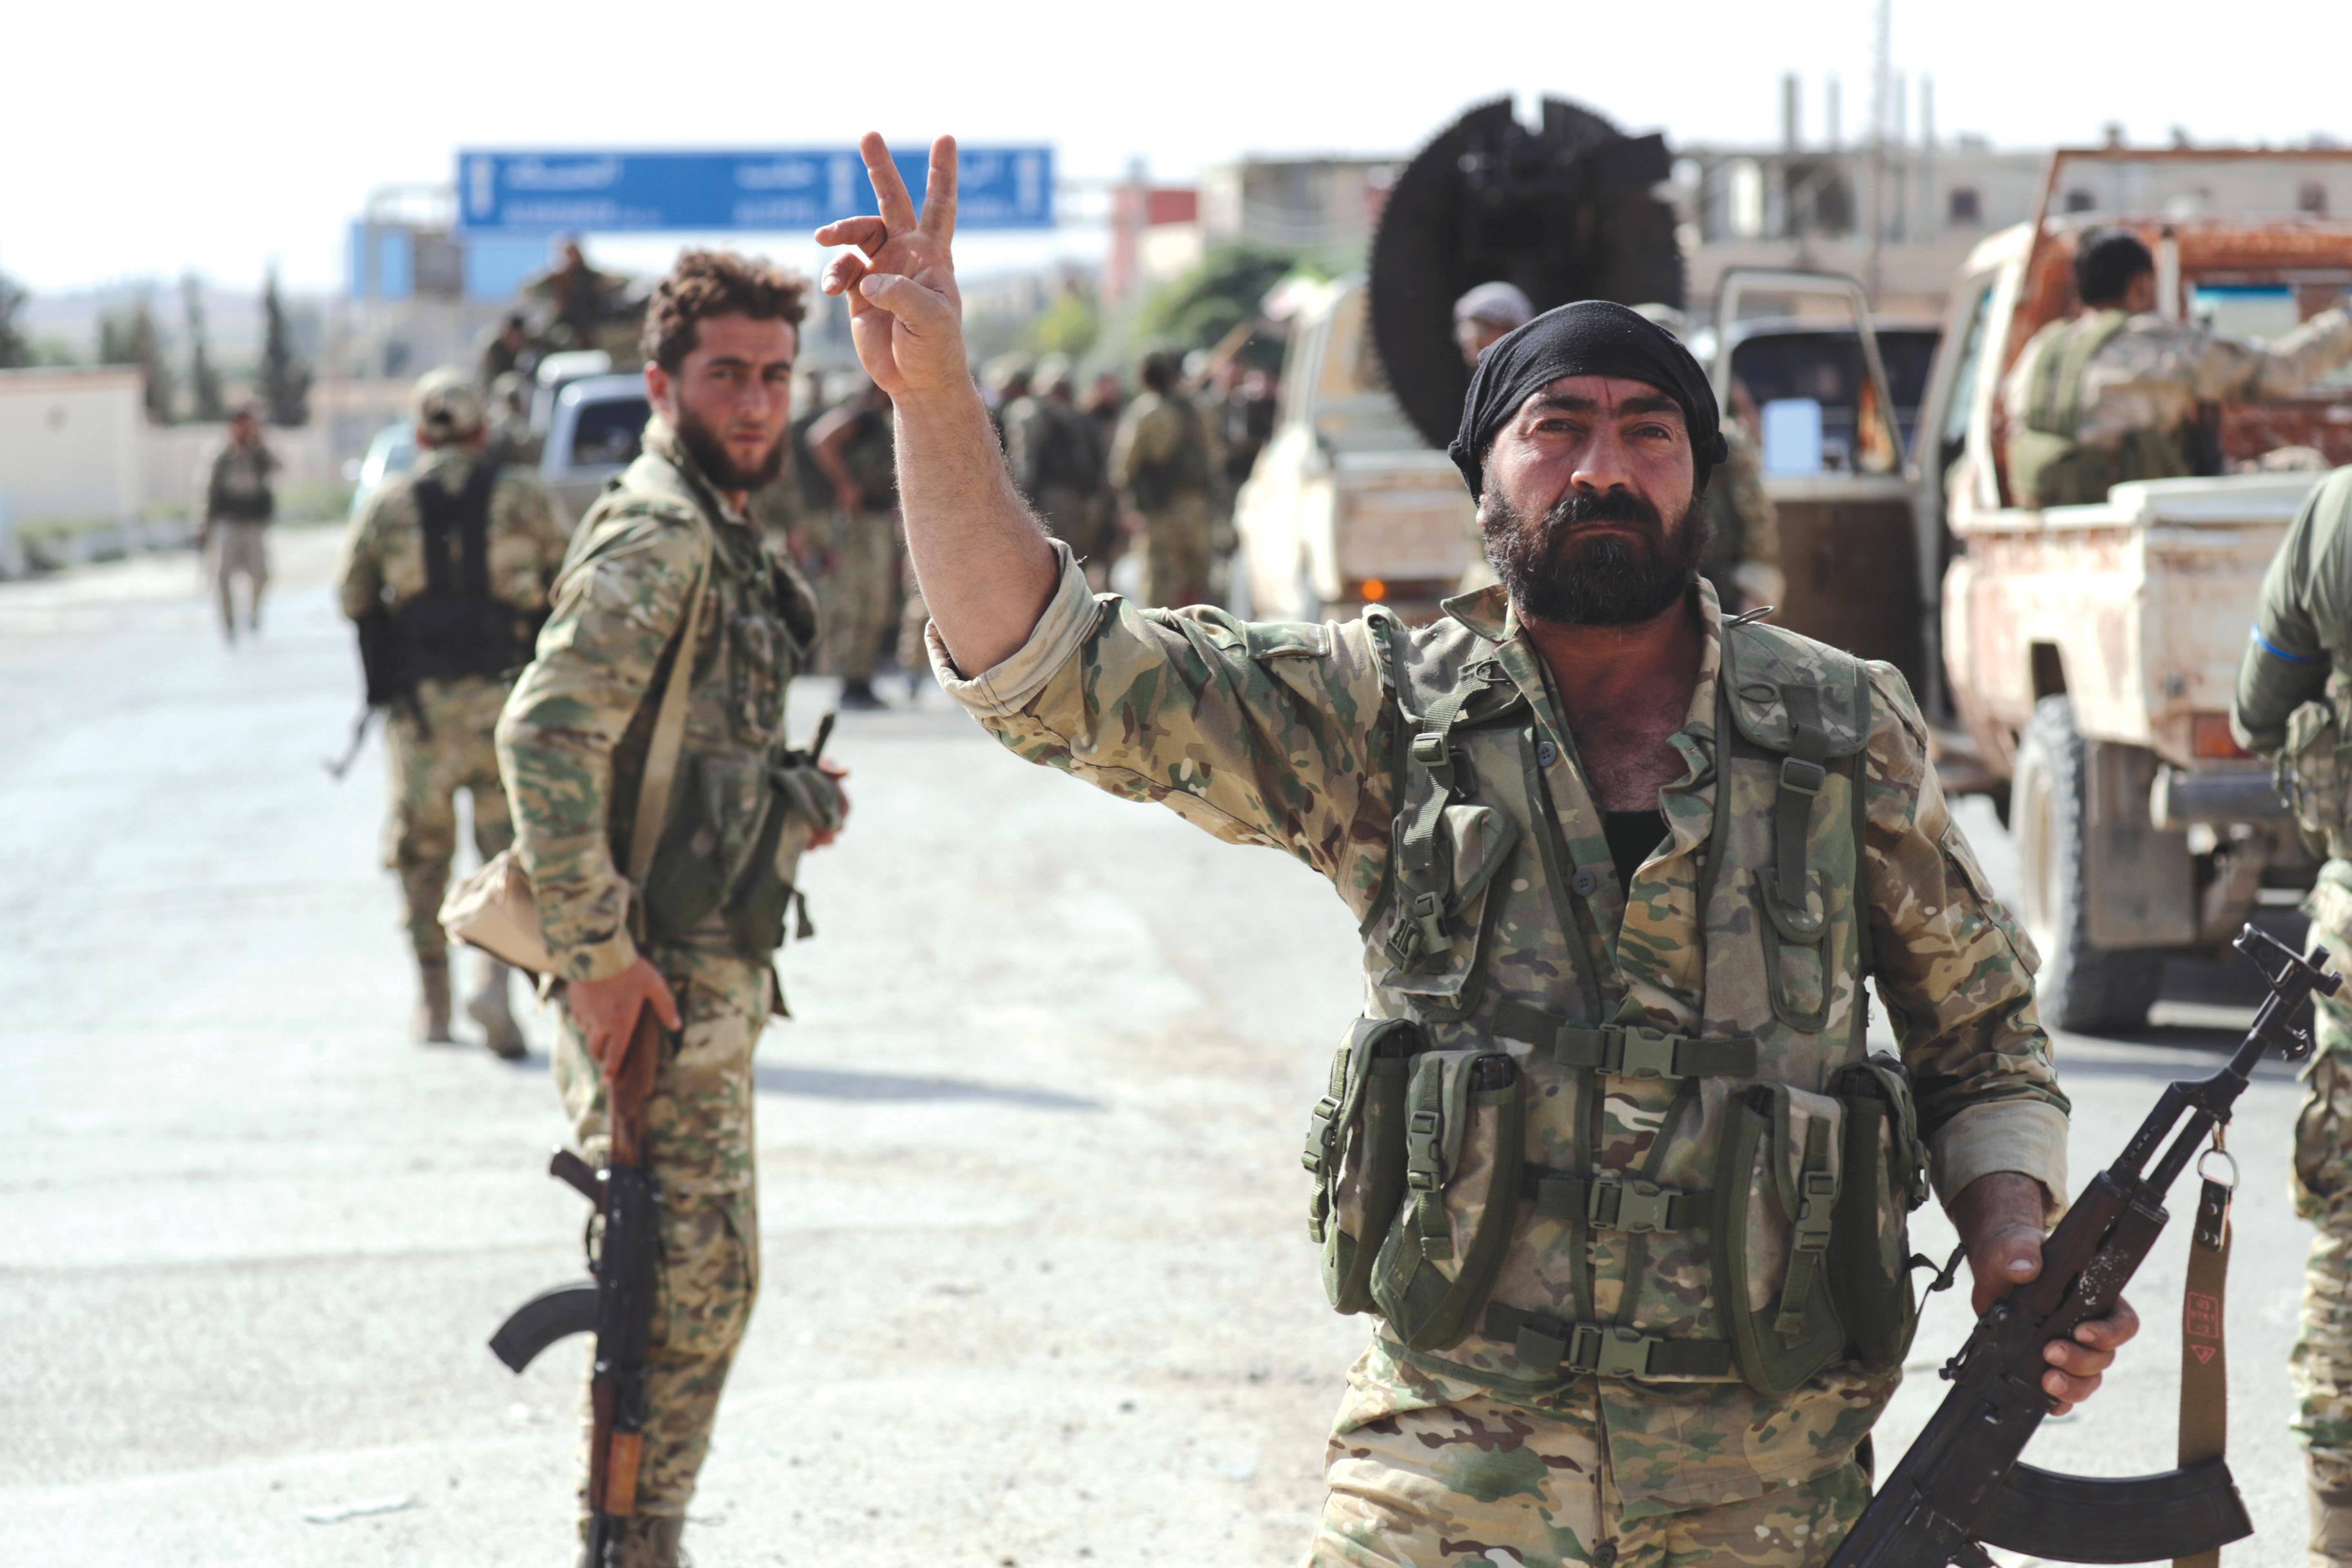 New sanctions show Turkey's double-standards on terror